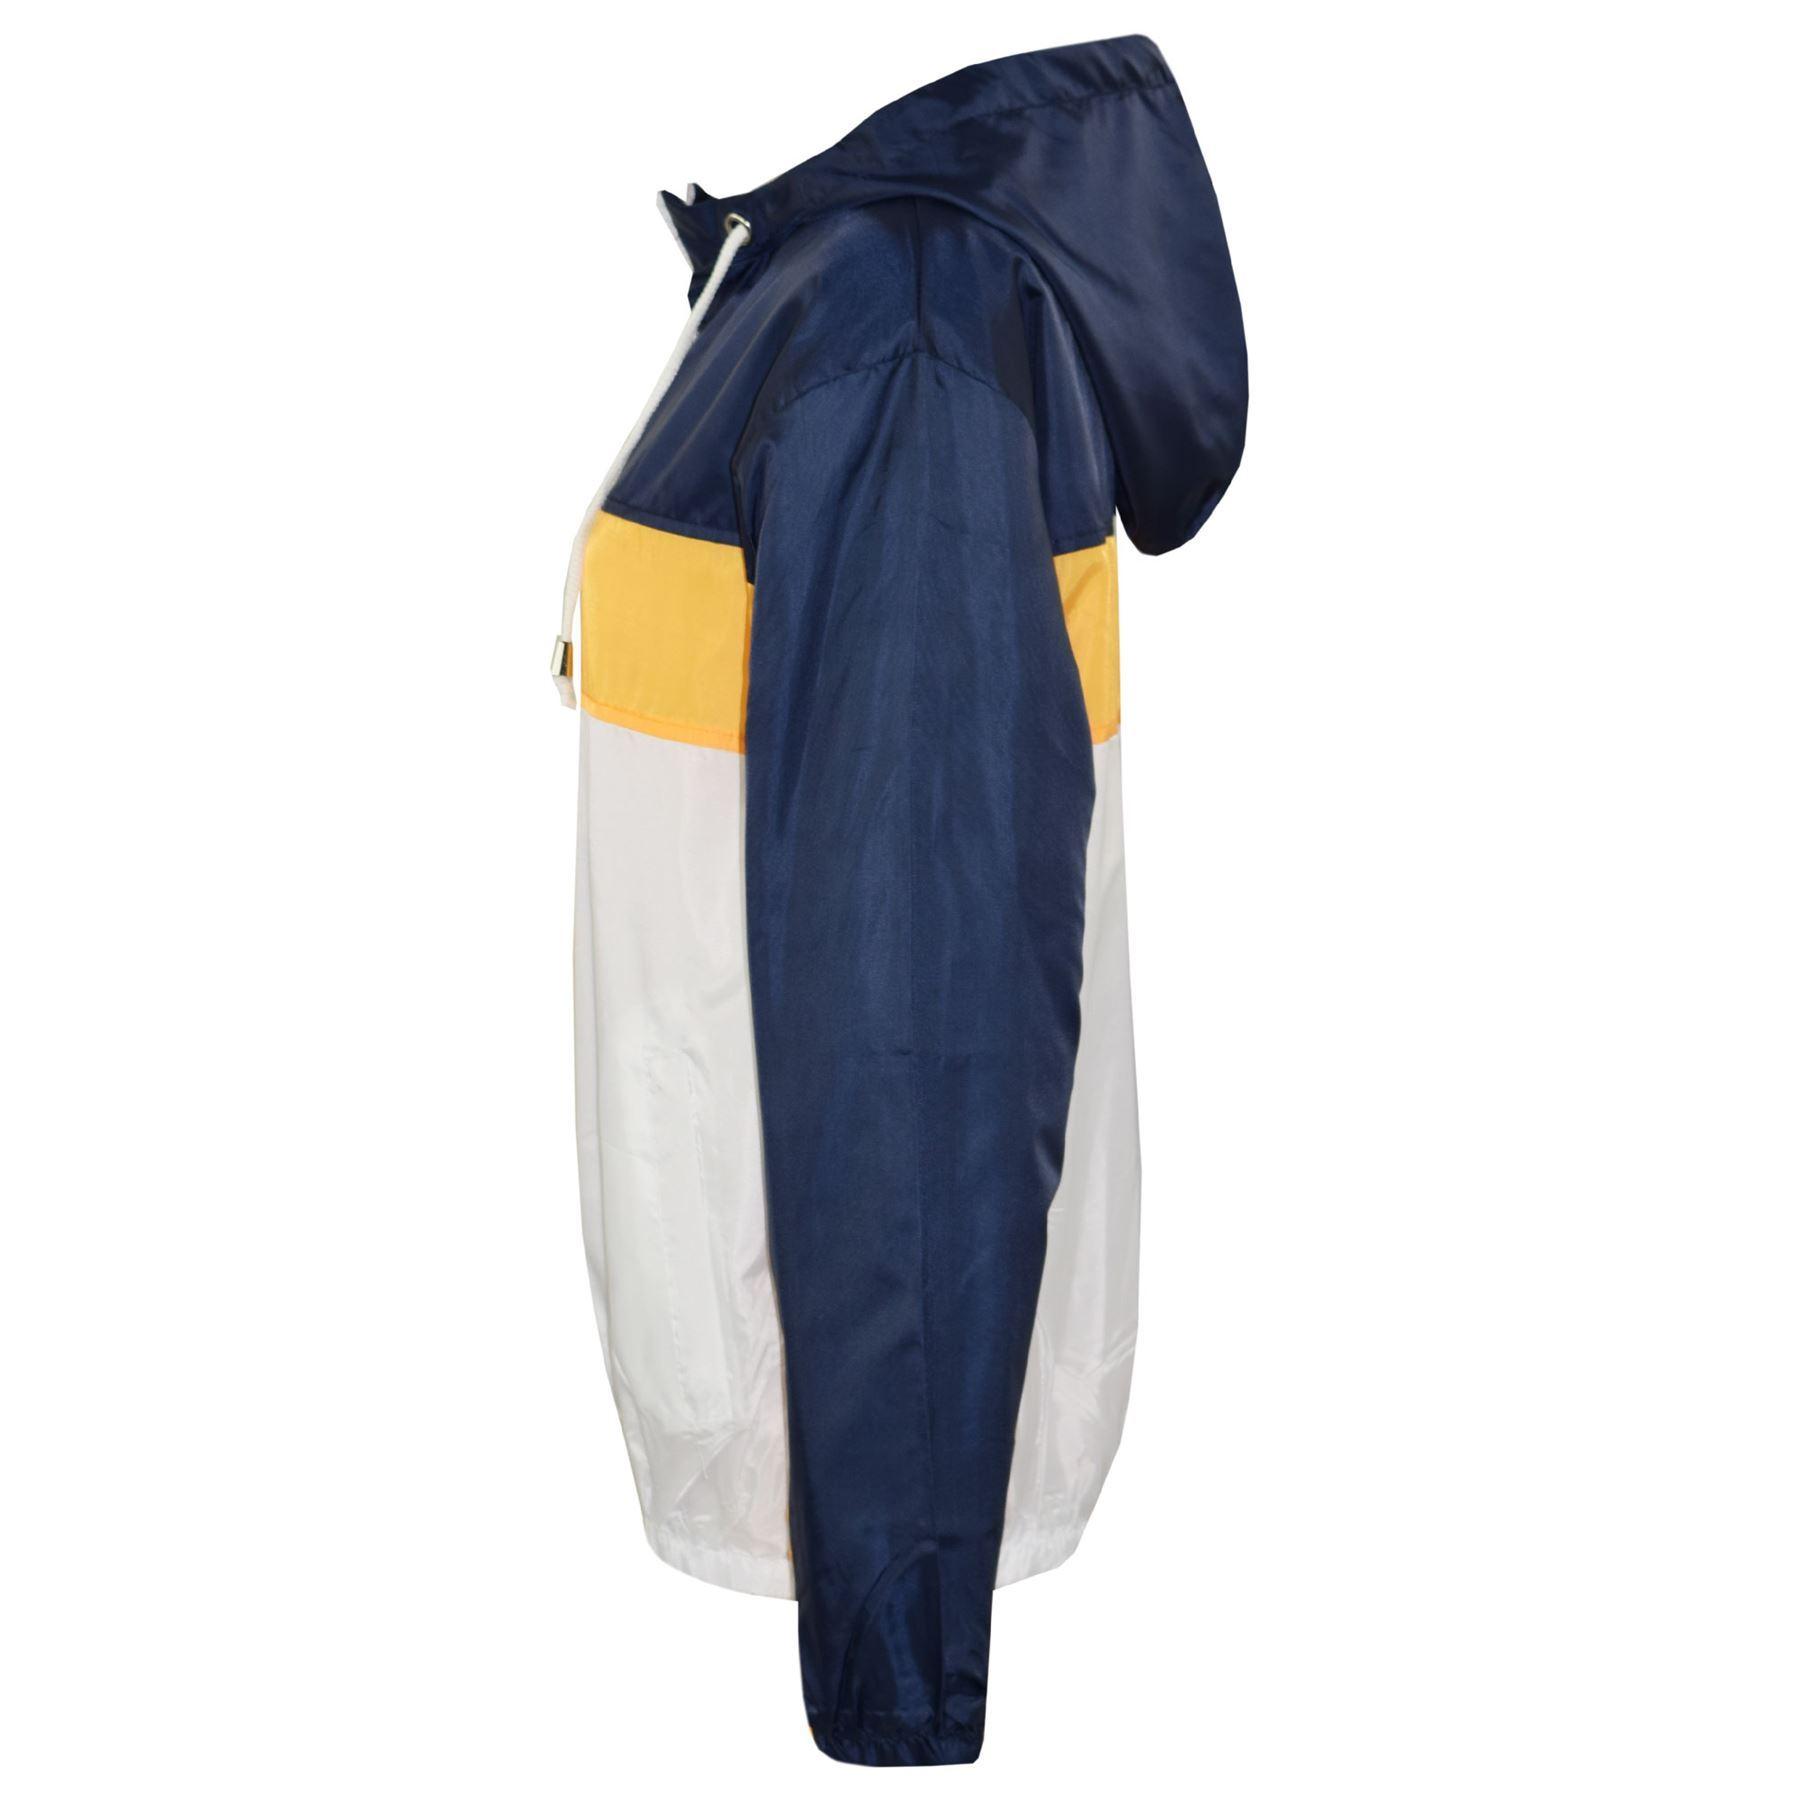 Kids-Boys-Girls-Windbreaker-Contrast-Block-Hooded-Jackets-Rain-Mac-Raincoat-5-13 thumbnail 10